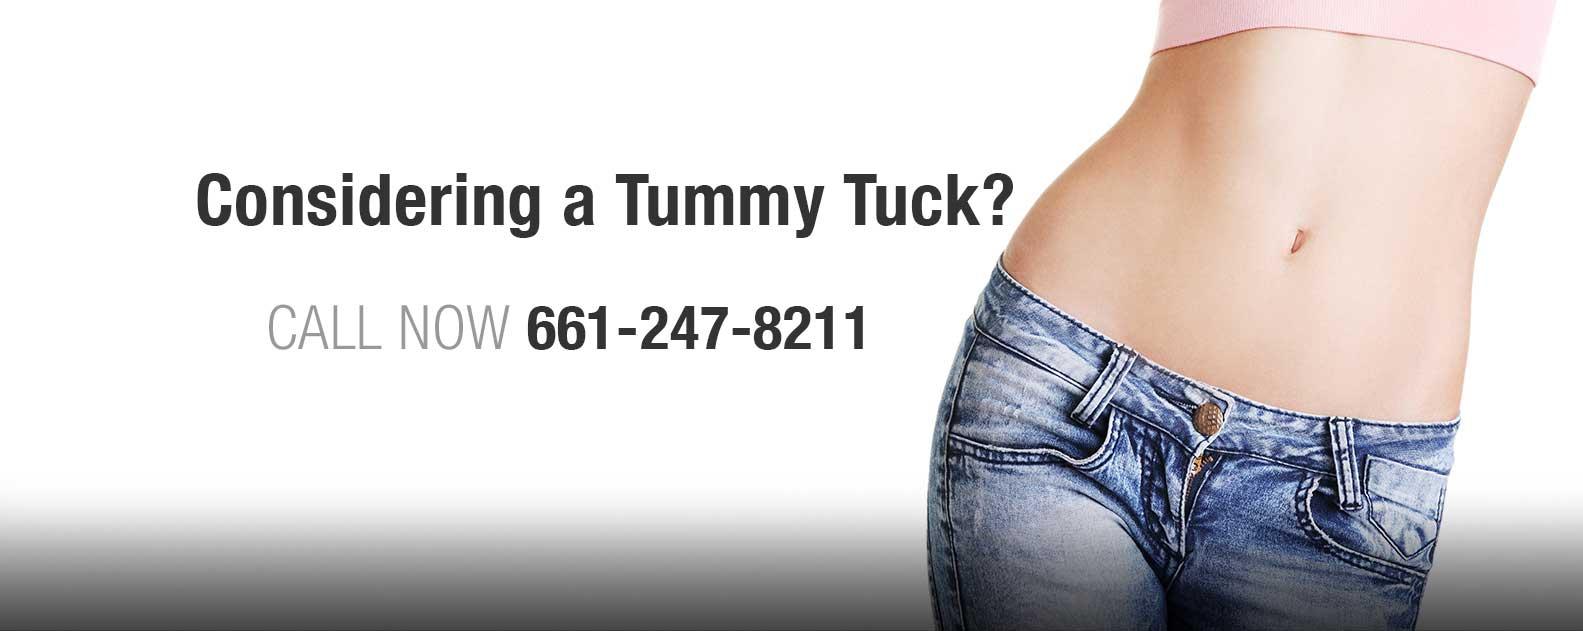 banners-tummy-tuck